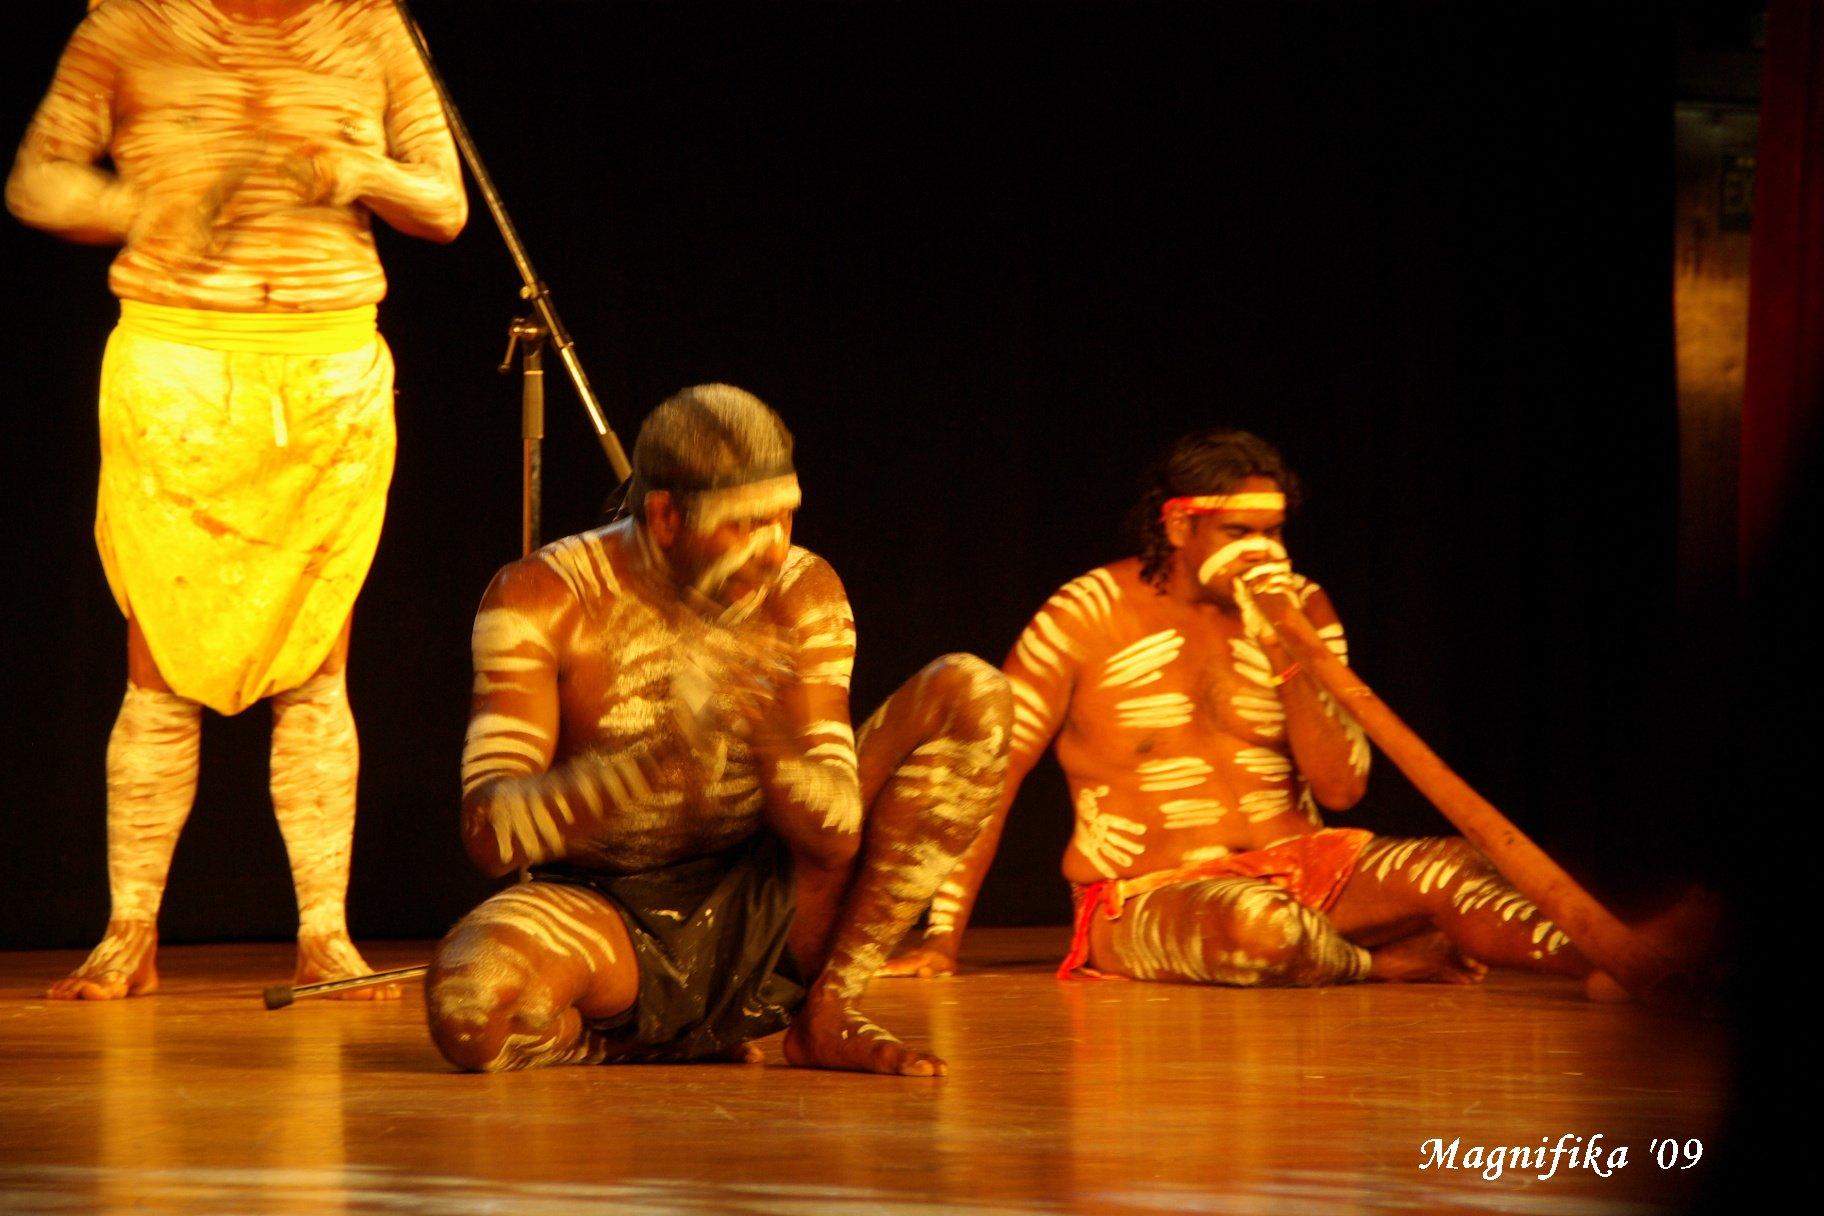 ASUKA II 南太平洋グランドクルーズ2009-25 アボリジニのショー Aboriginals Performance_e0140365_2214582.jpg